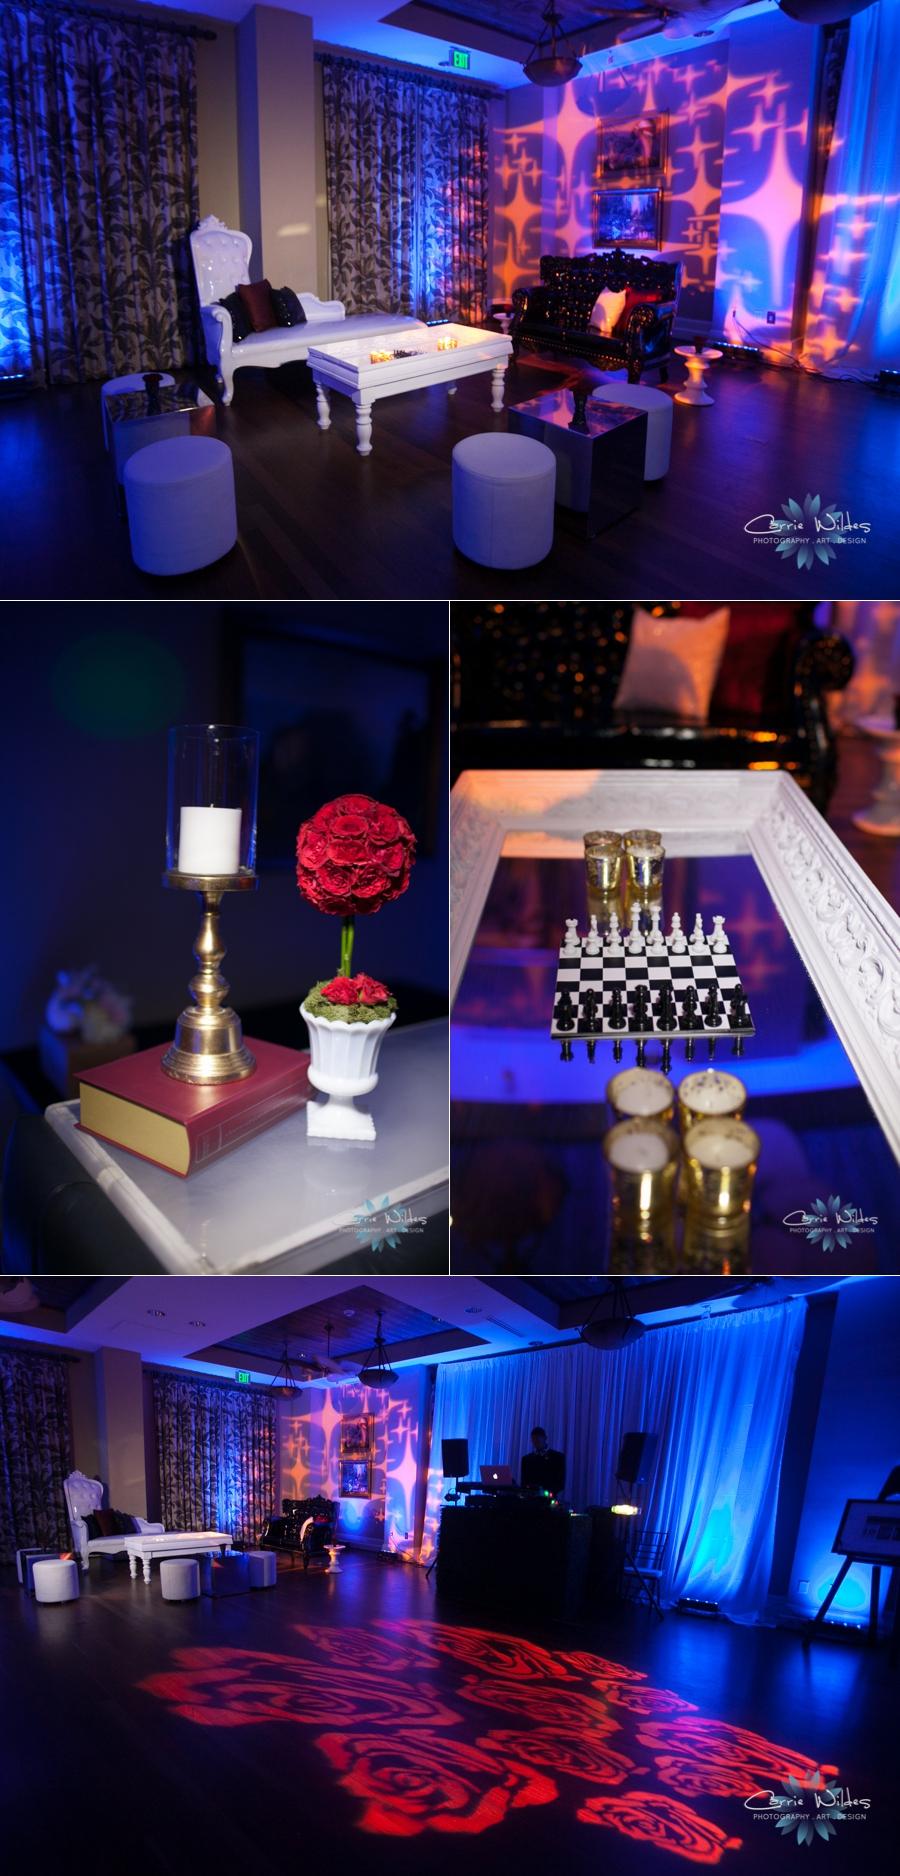 10_19_13 Celebration Bohemian Hotel Wedding_0017.jpg